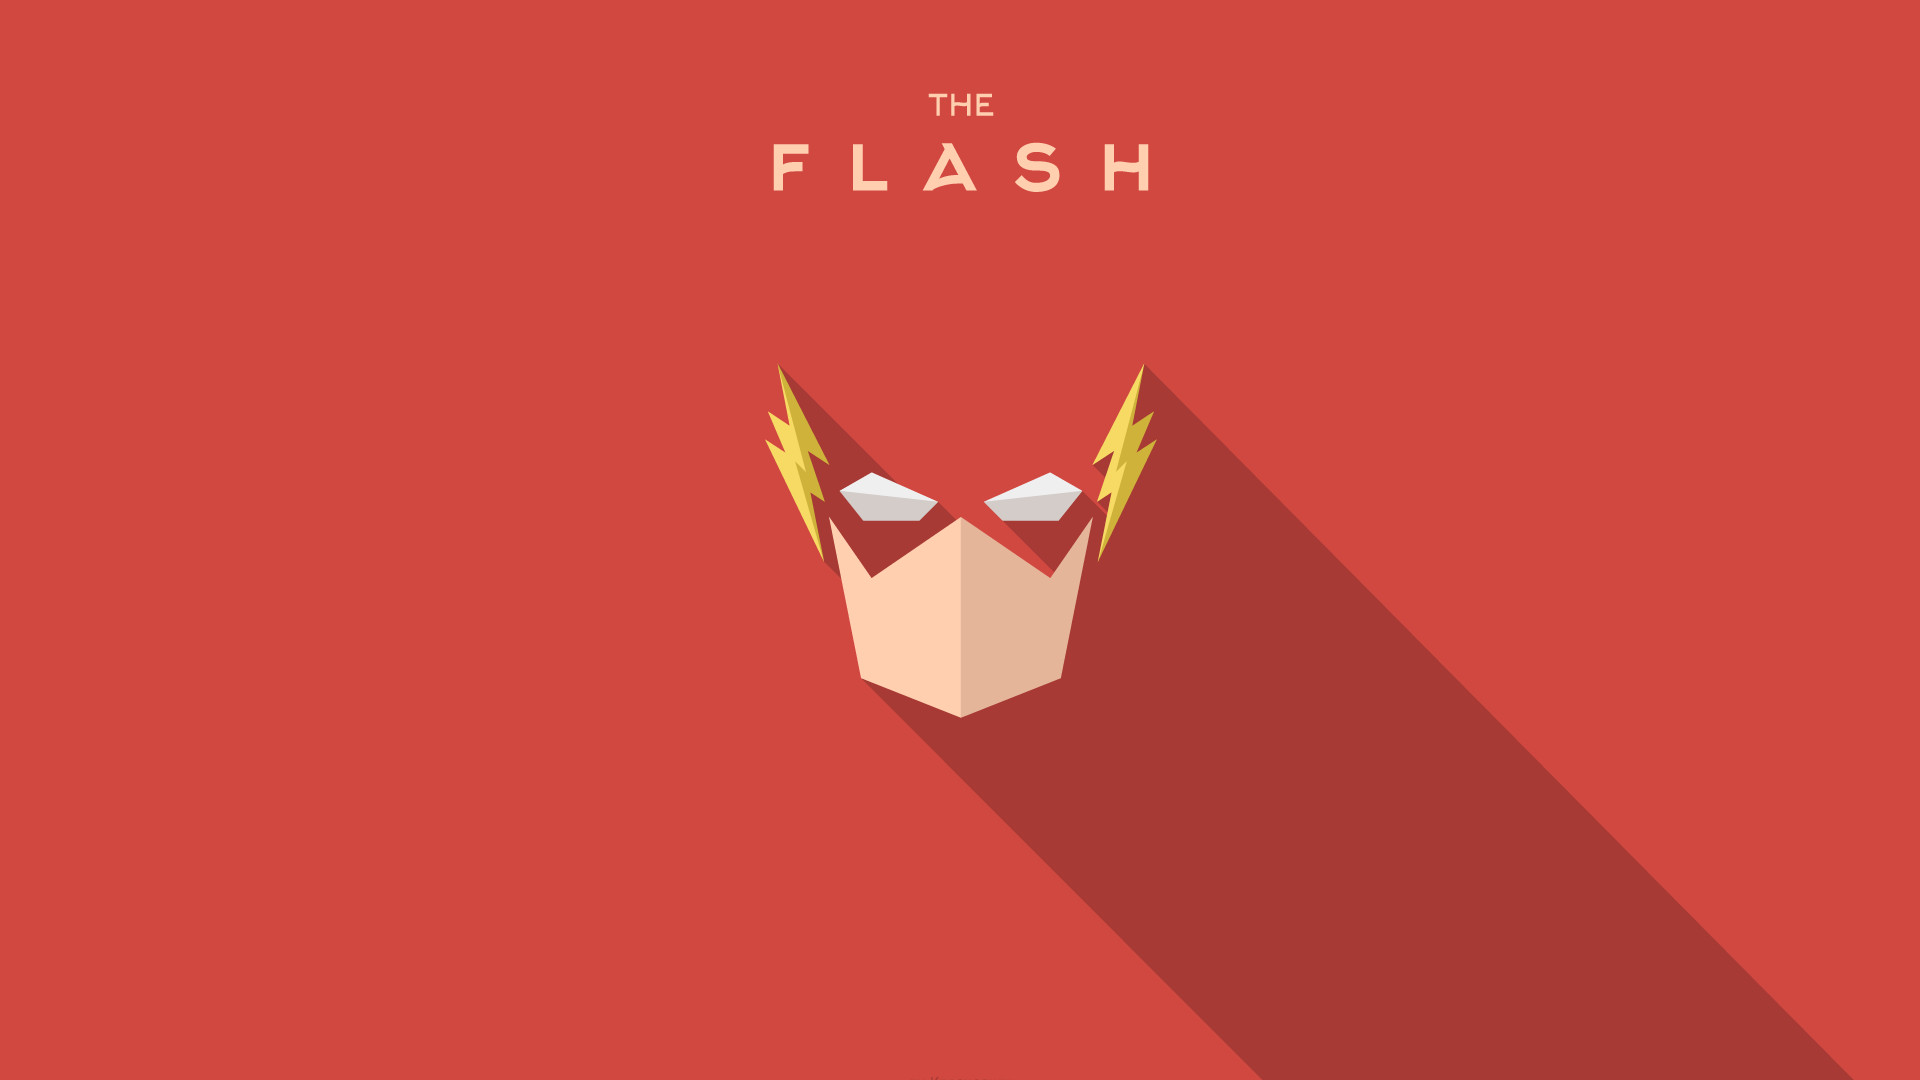 Flash Vs Reverse Flash Wallpaper 81 Images